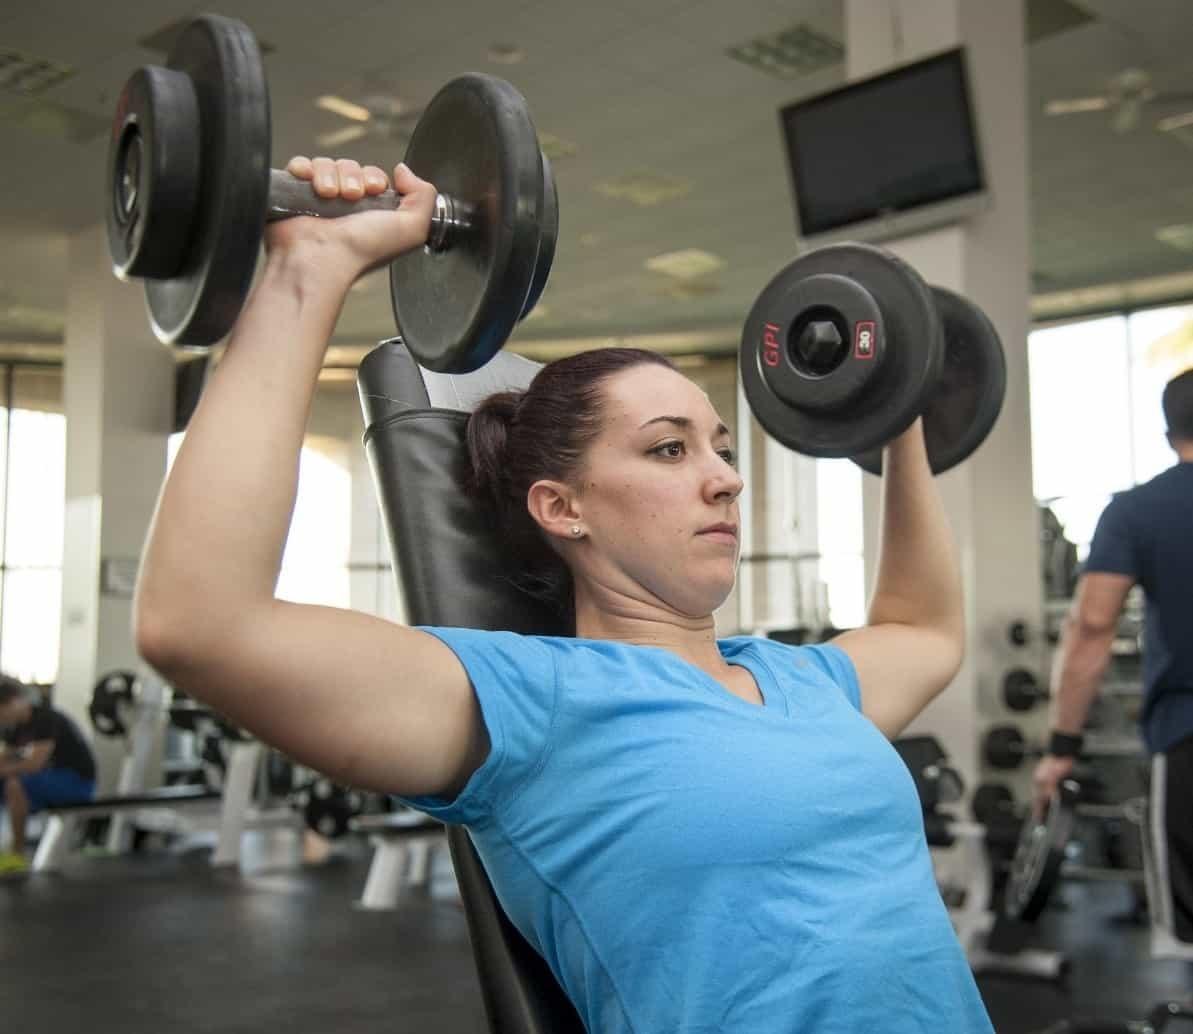 supraspinatus exercises - weightlifting